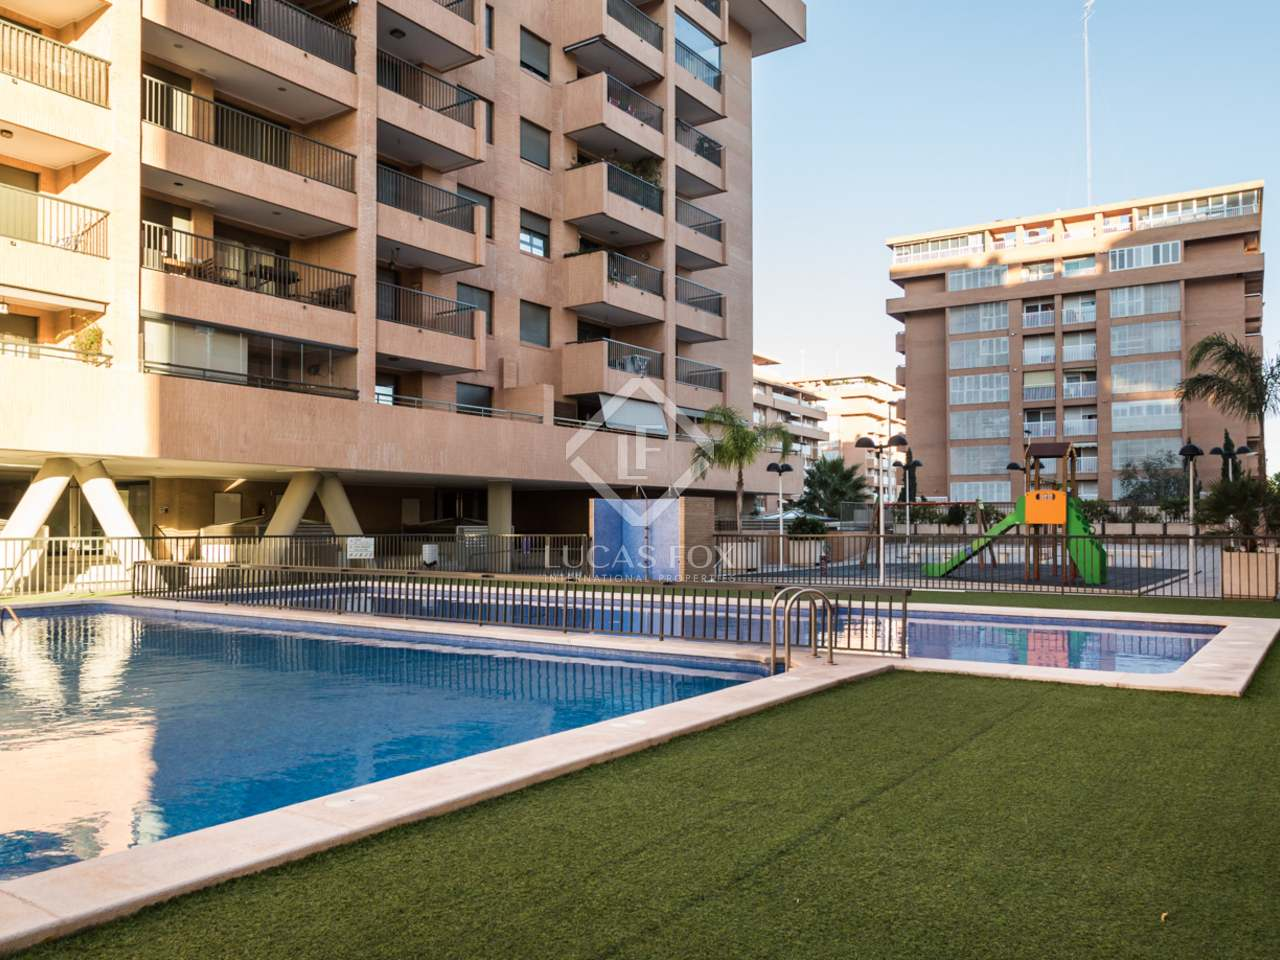 Appartement vendre dans un complexe avec piscine playa for Complexe piscine